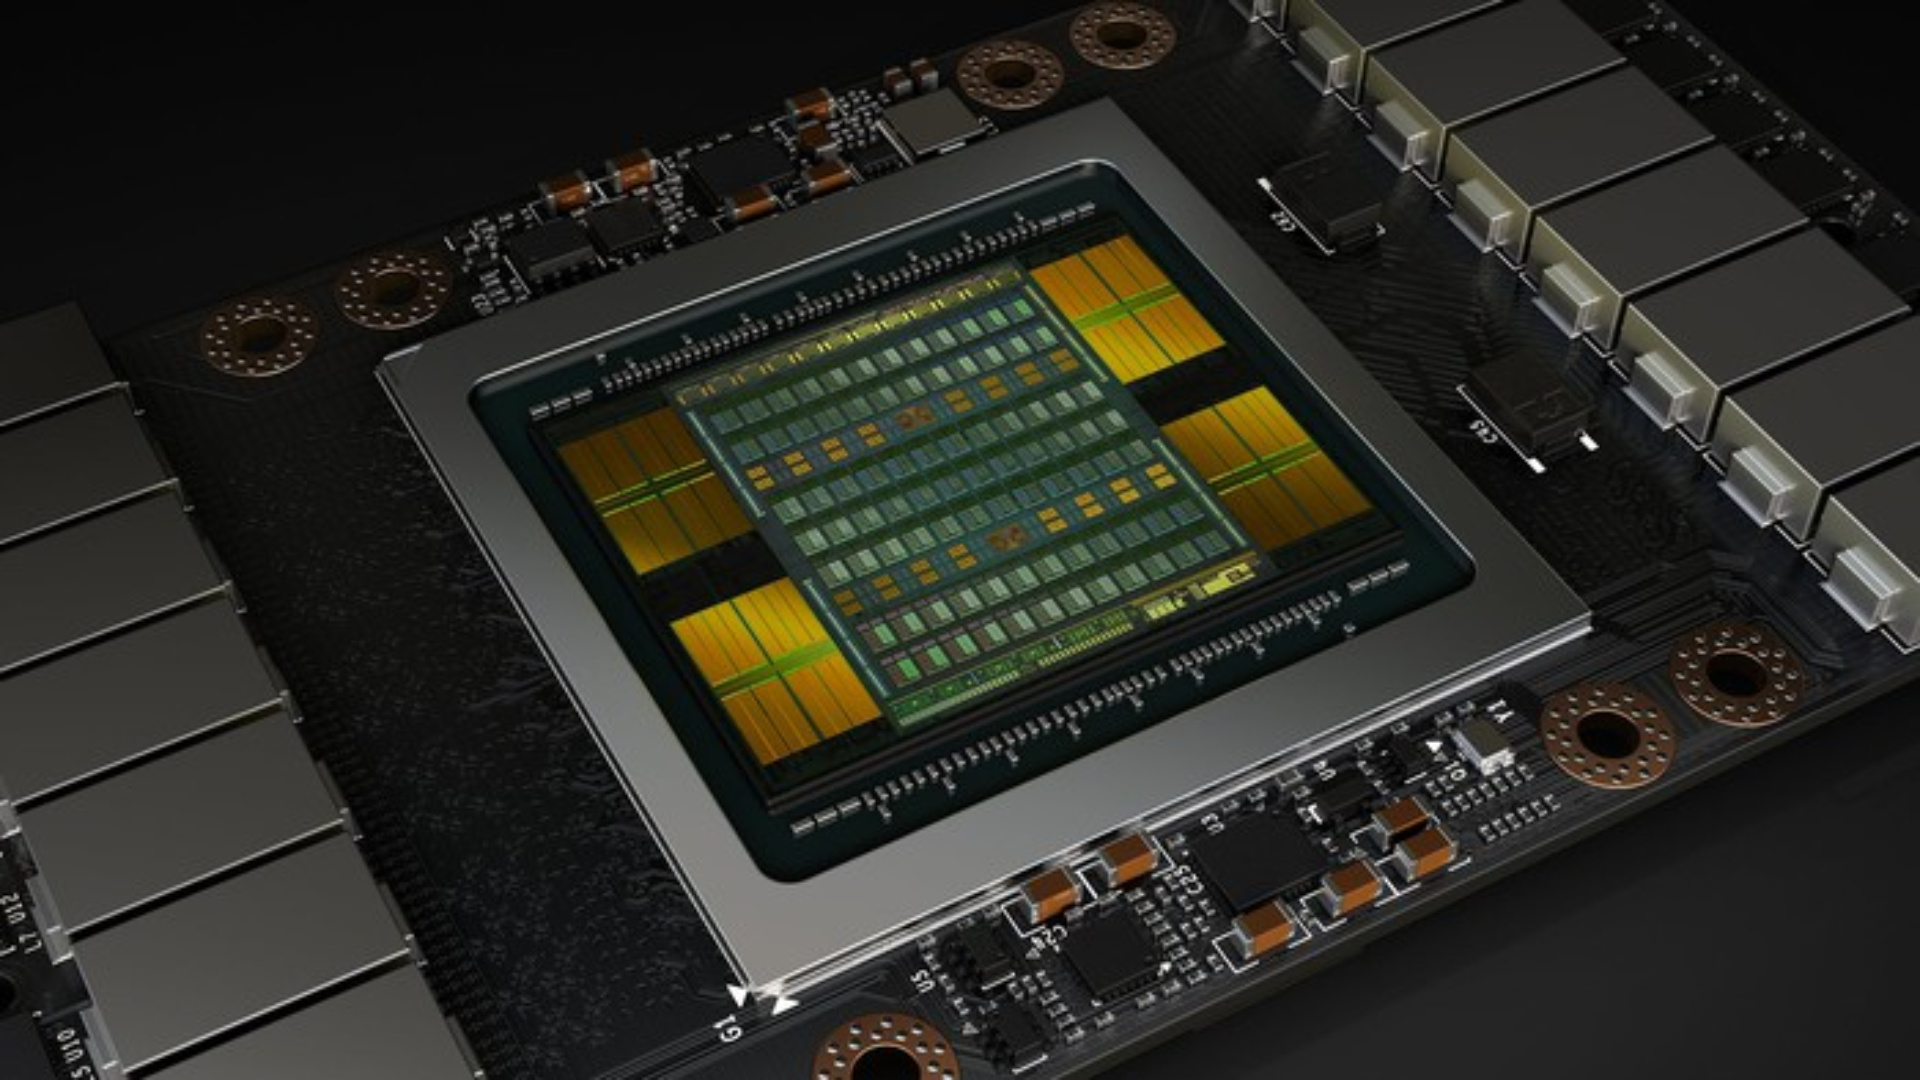 NVIDIA's Tesla V100 data center GPU.